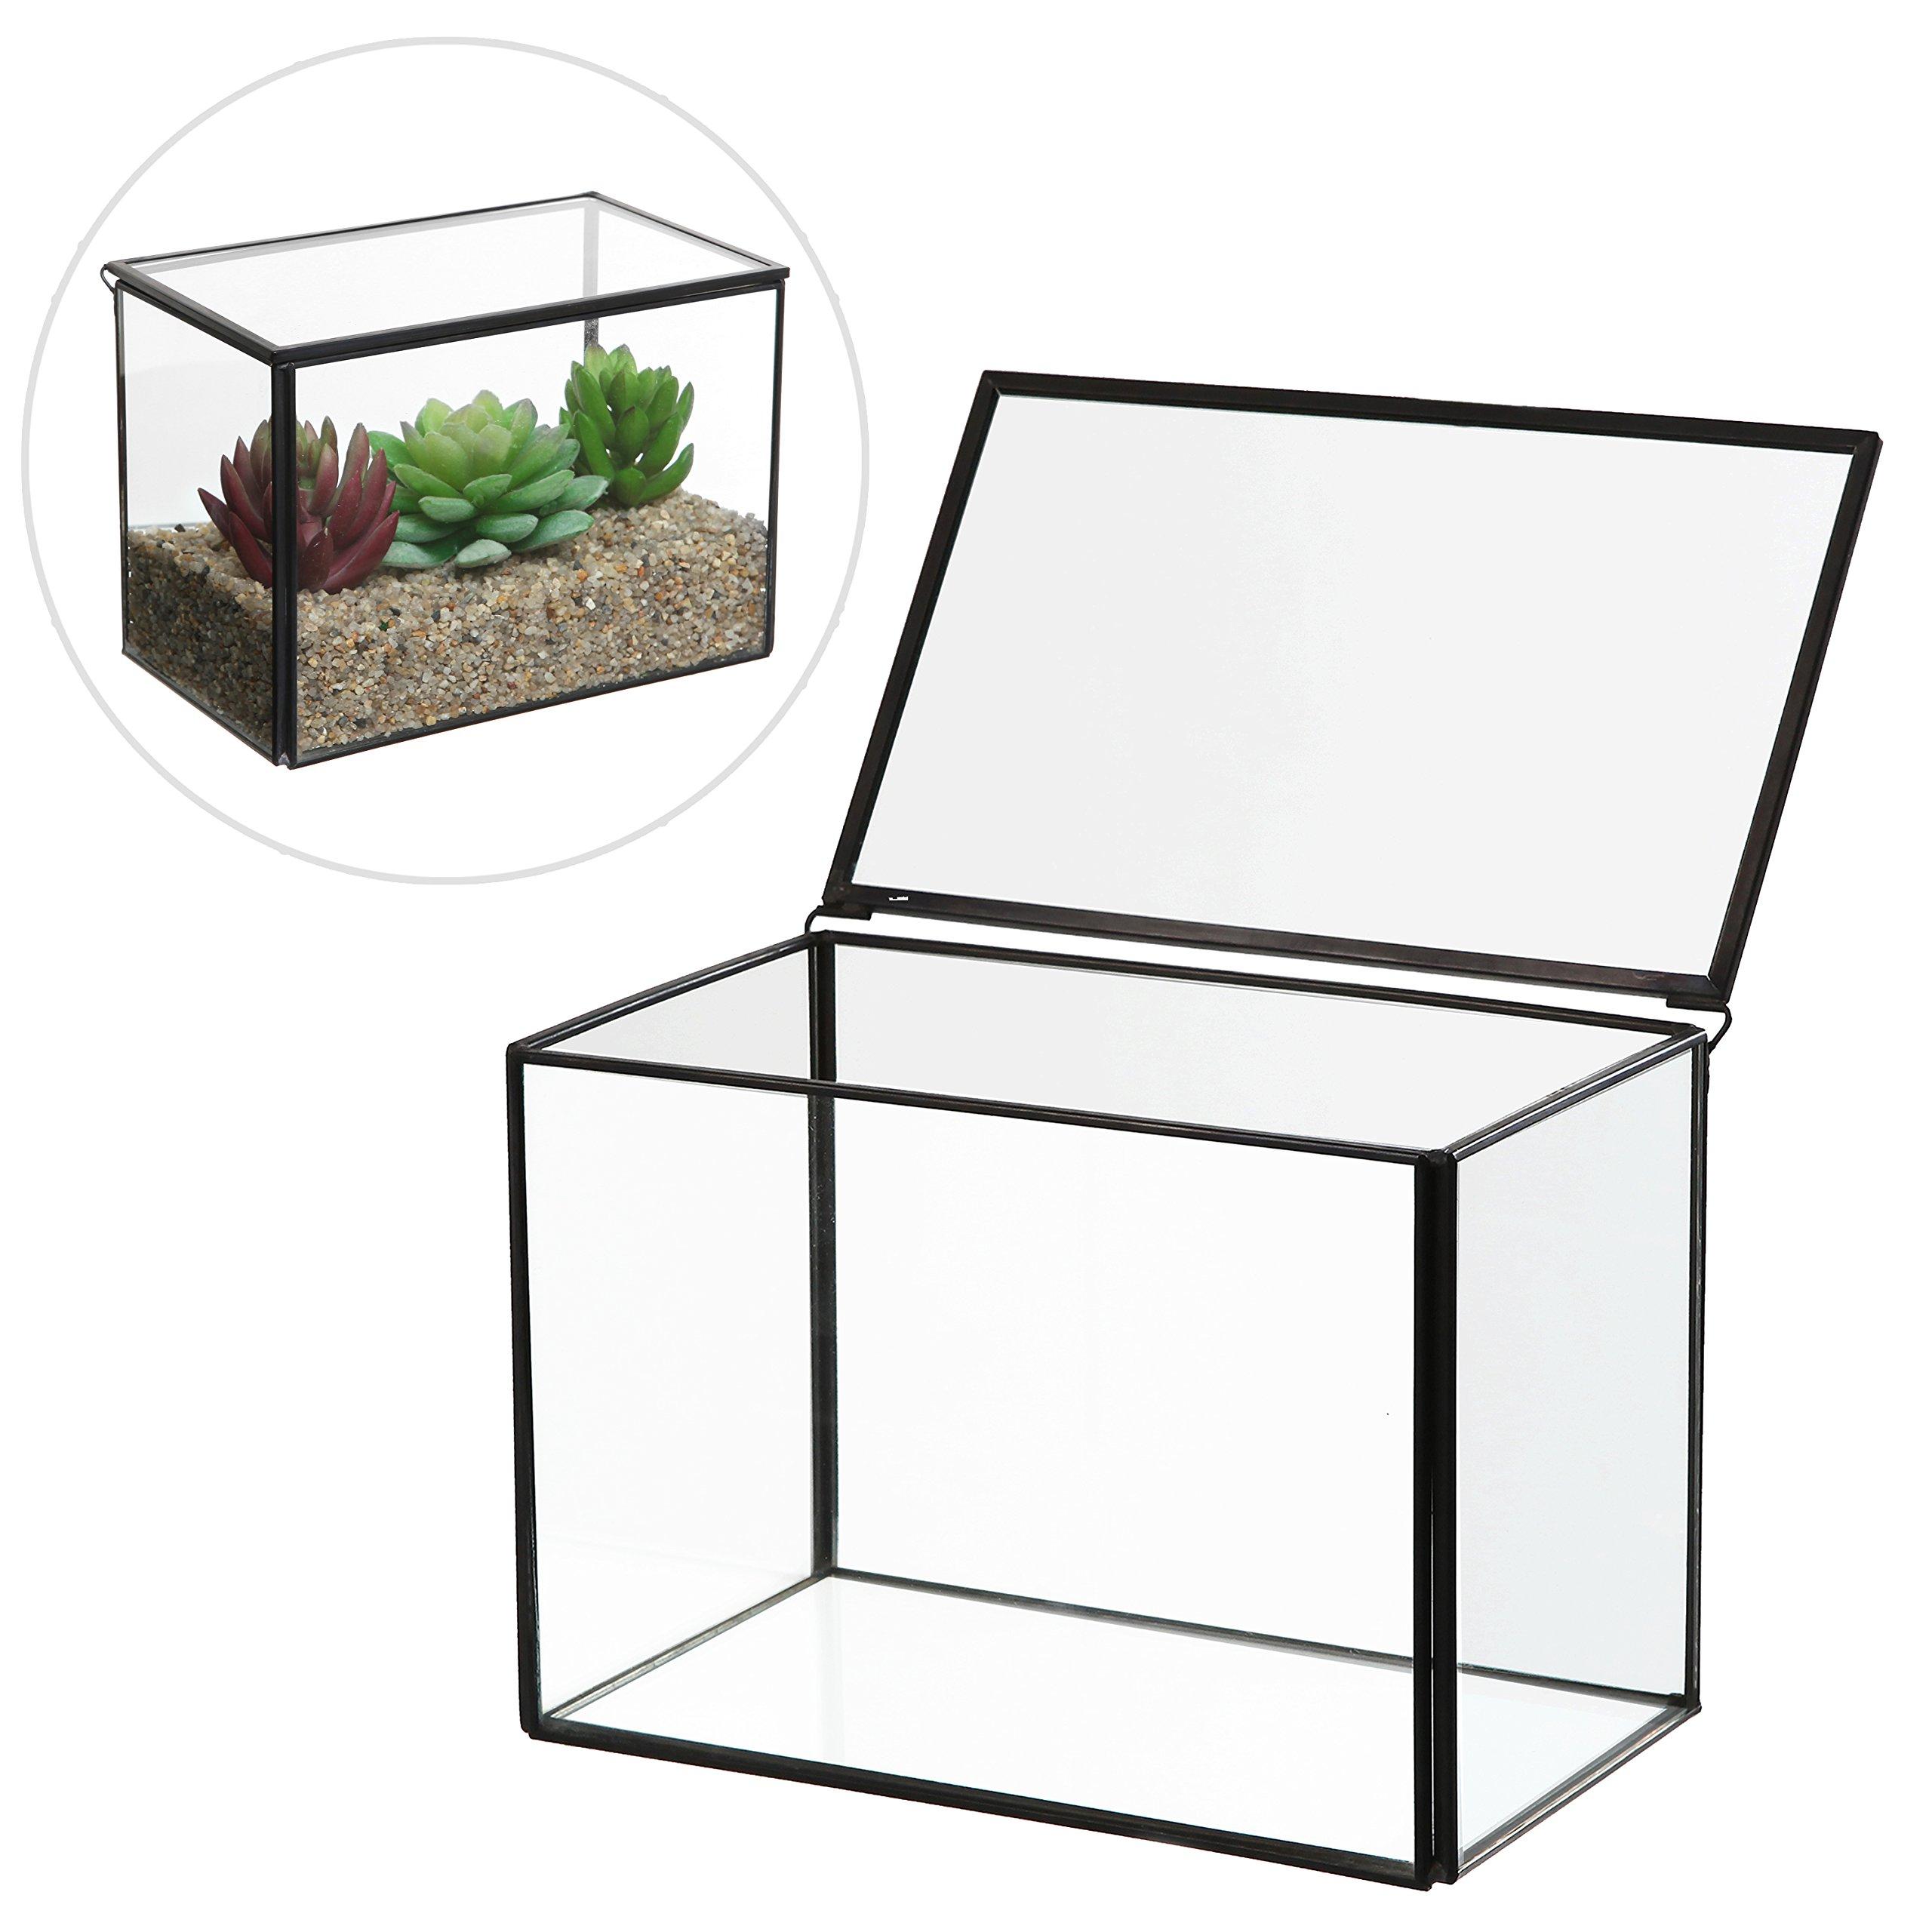 6.5 inch Clear Glass Rectangular Succulent Terrarium Box / Decorative Air Plant Garden Display Case by MyGift